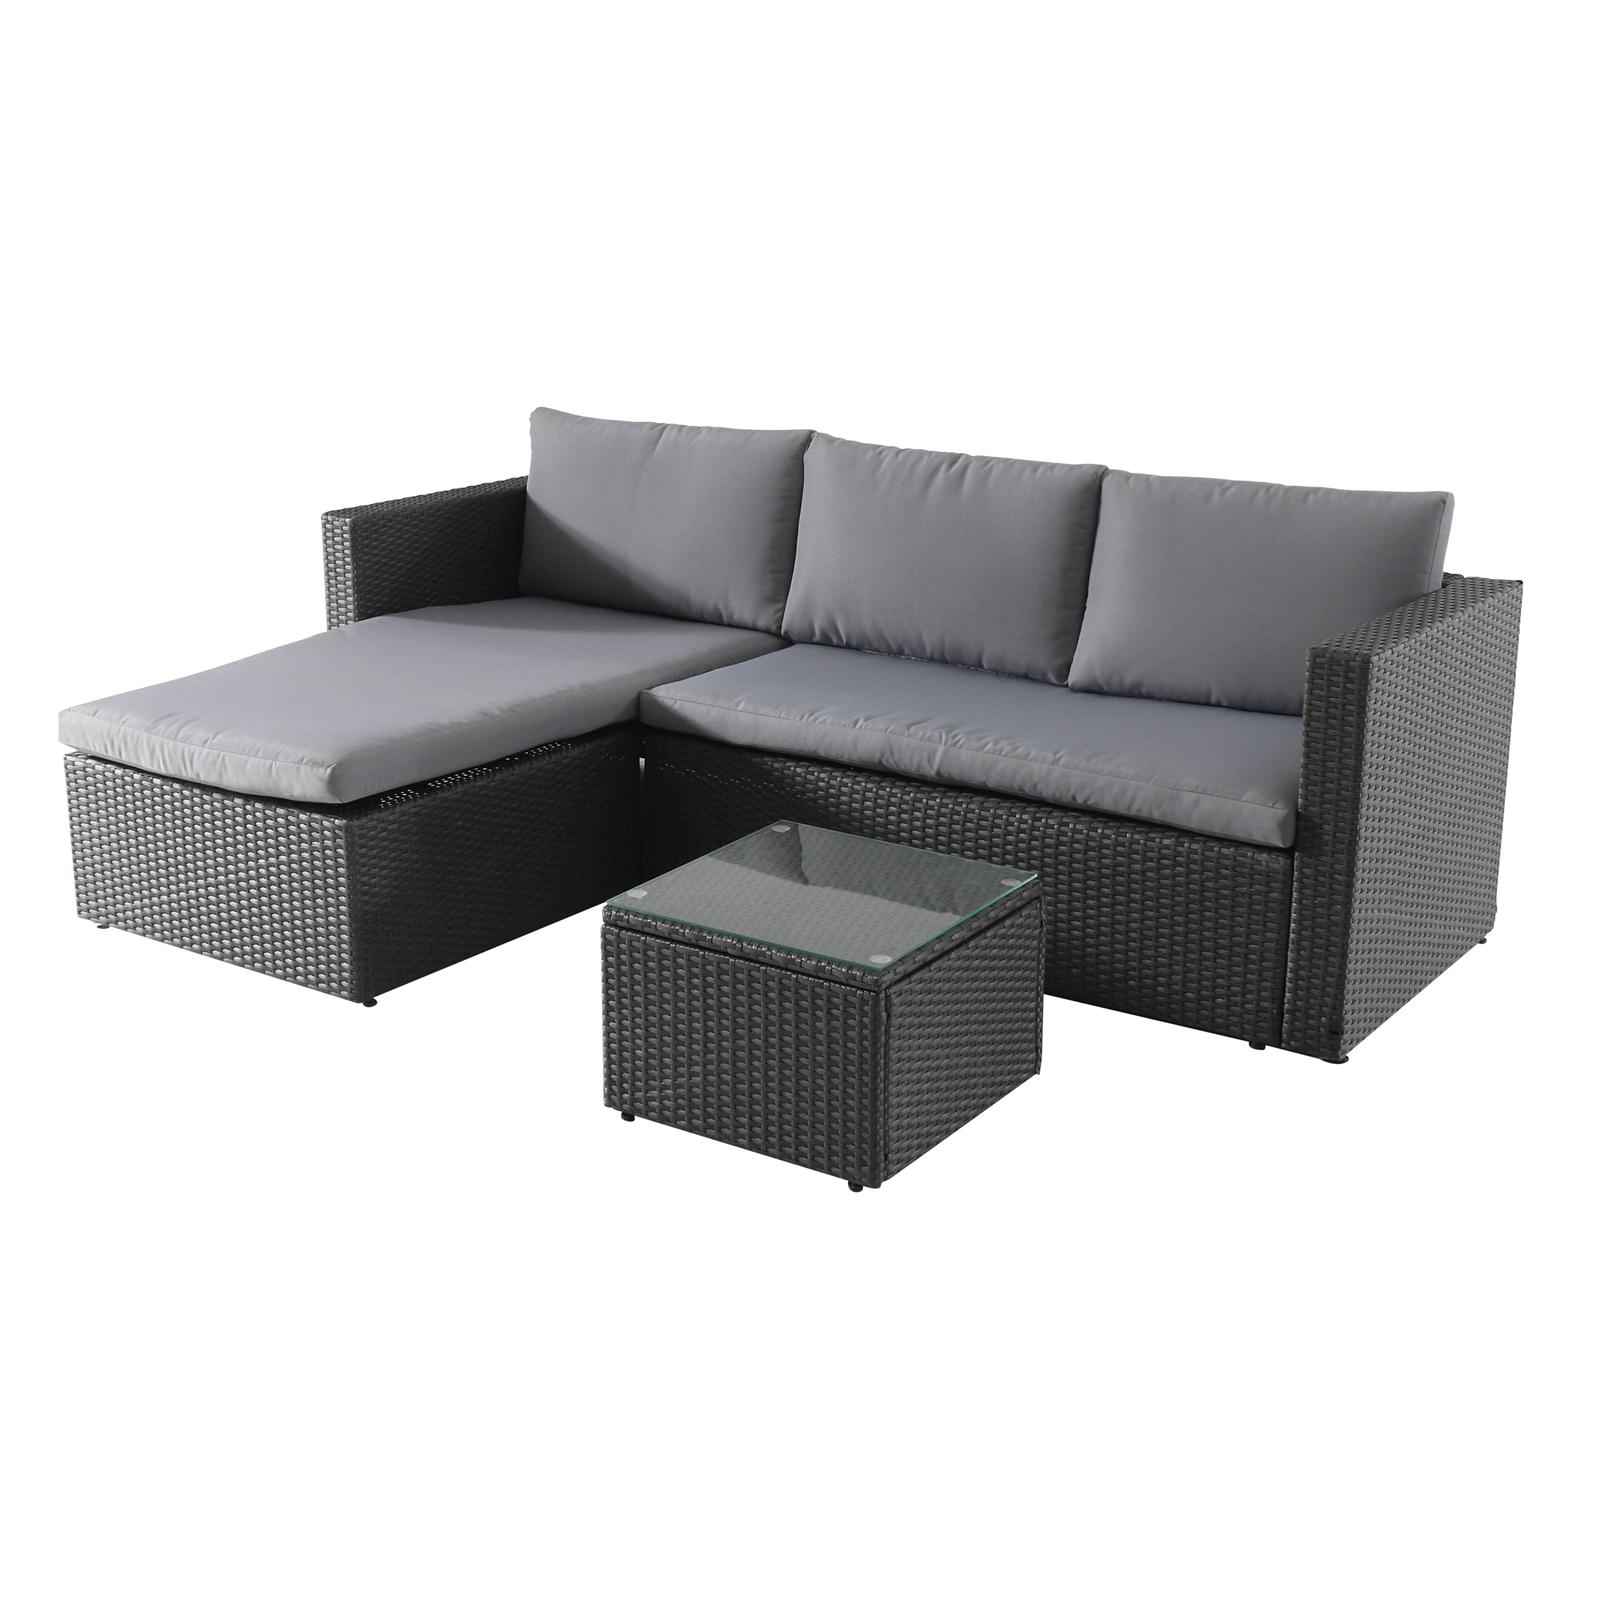 Alexandria Rattan Effect 3 Seater Dark Grey Corner Garden Sofa Set - £200 @ Homebase stock available online / free C&C